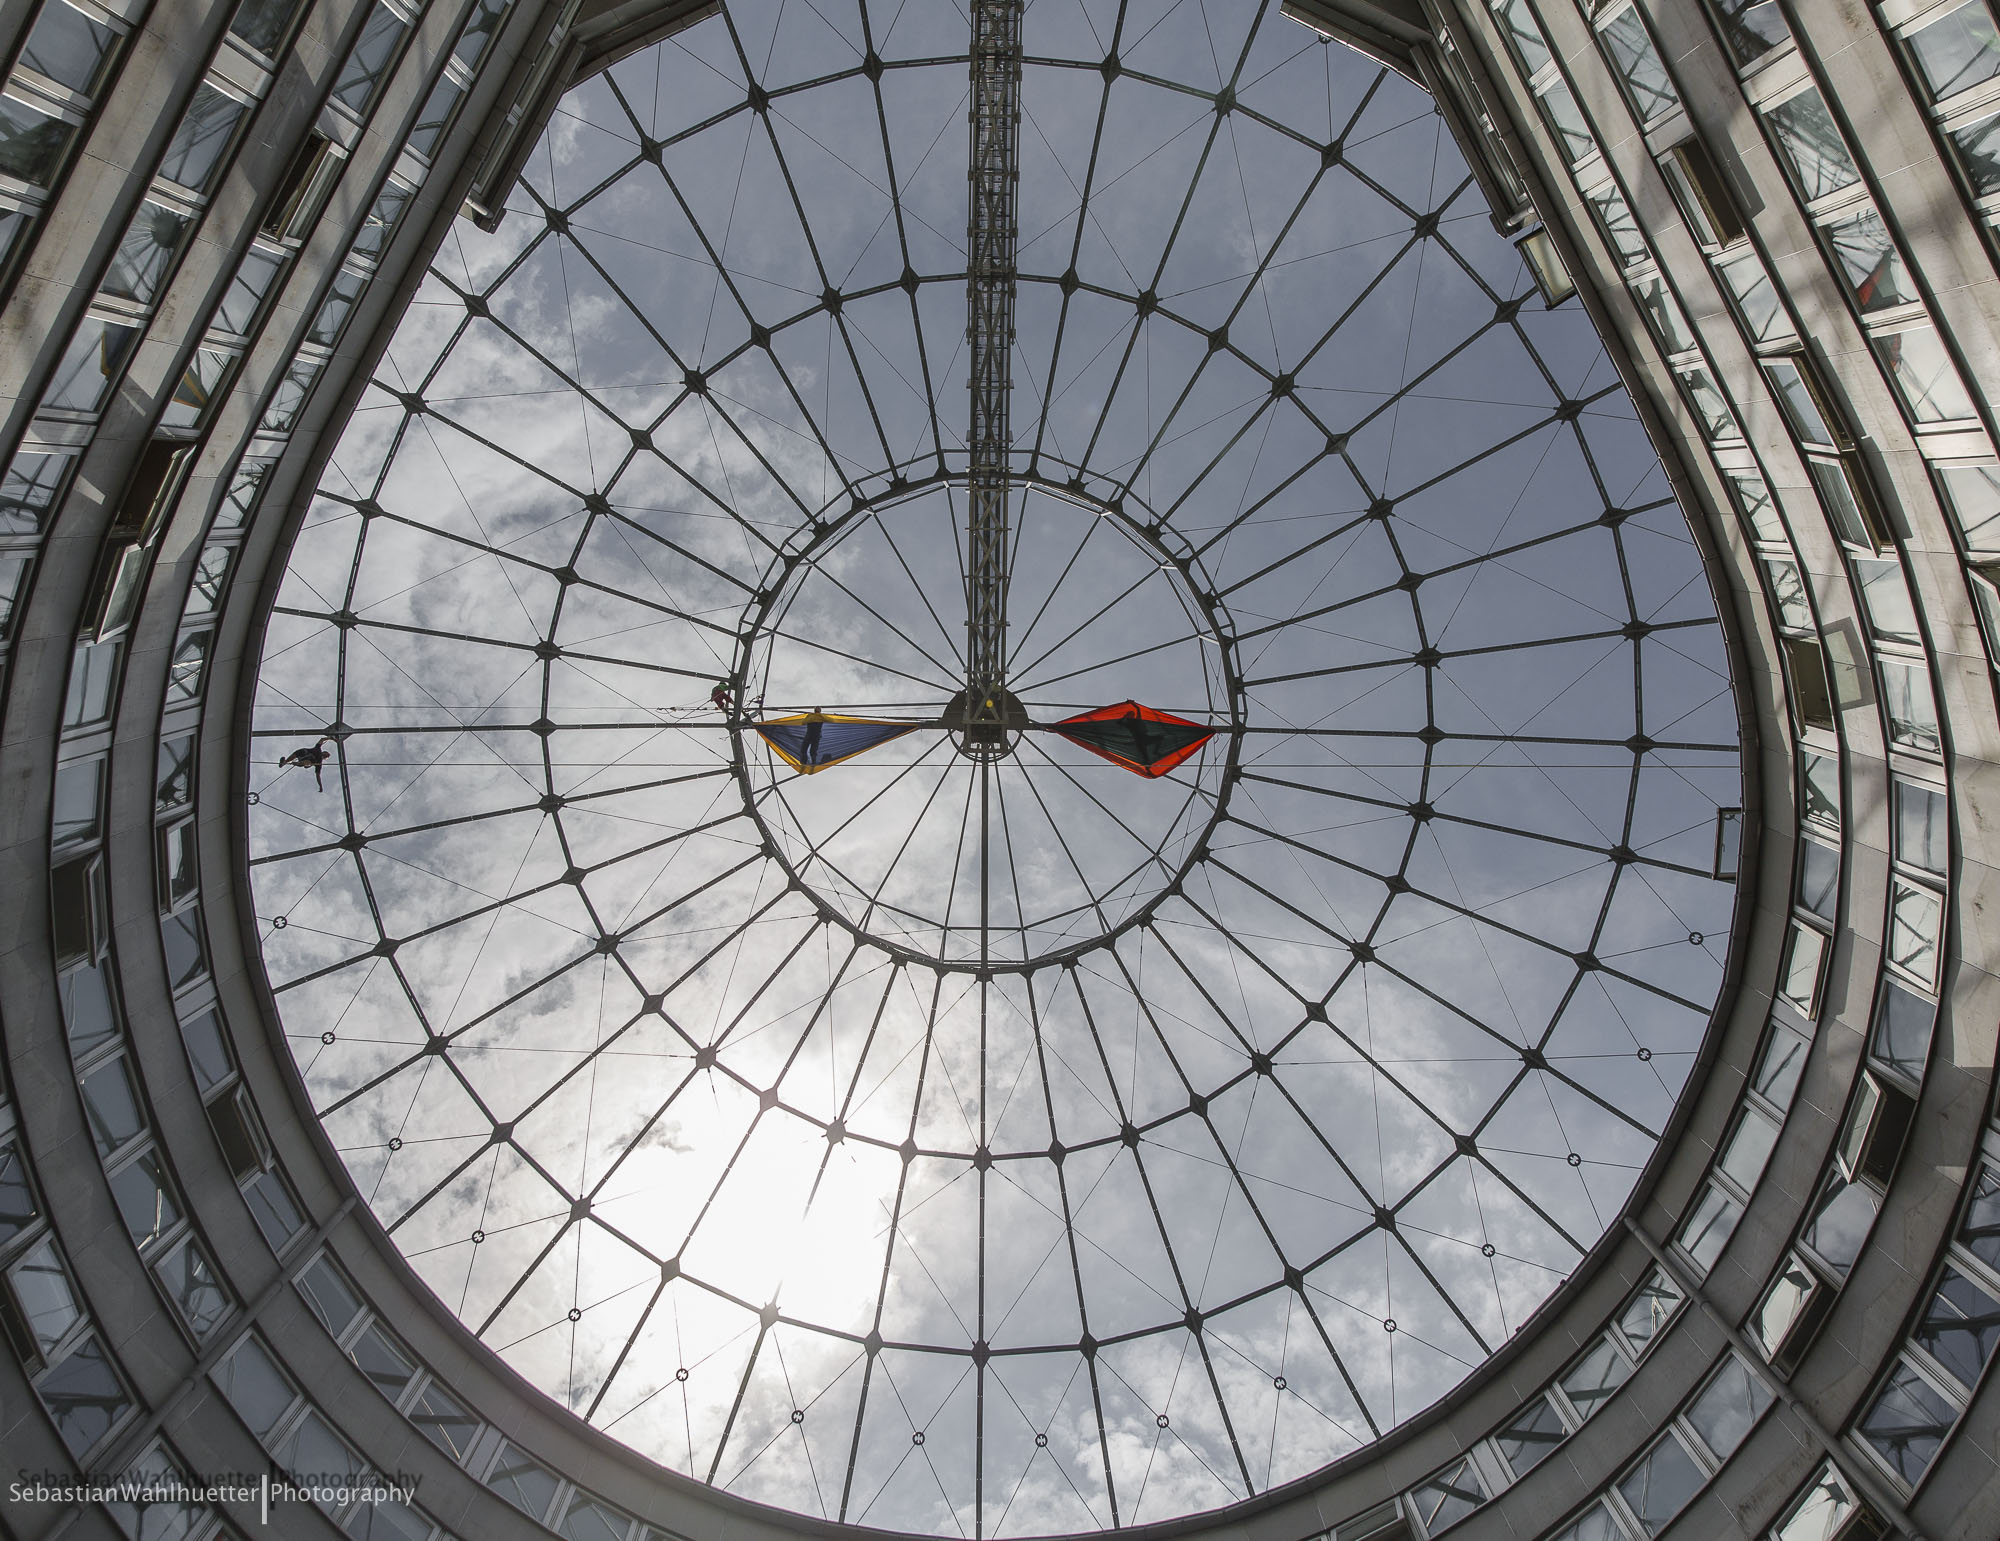 Highline Gasometer | Wahlhuetter Sebastian Photography | contact